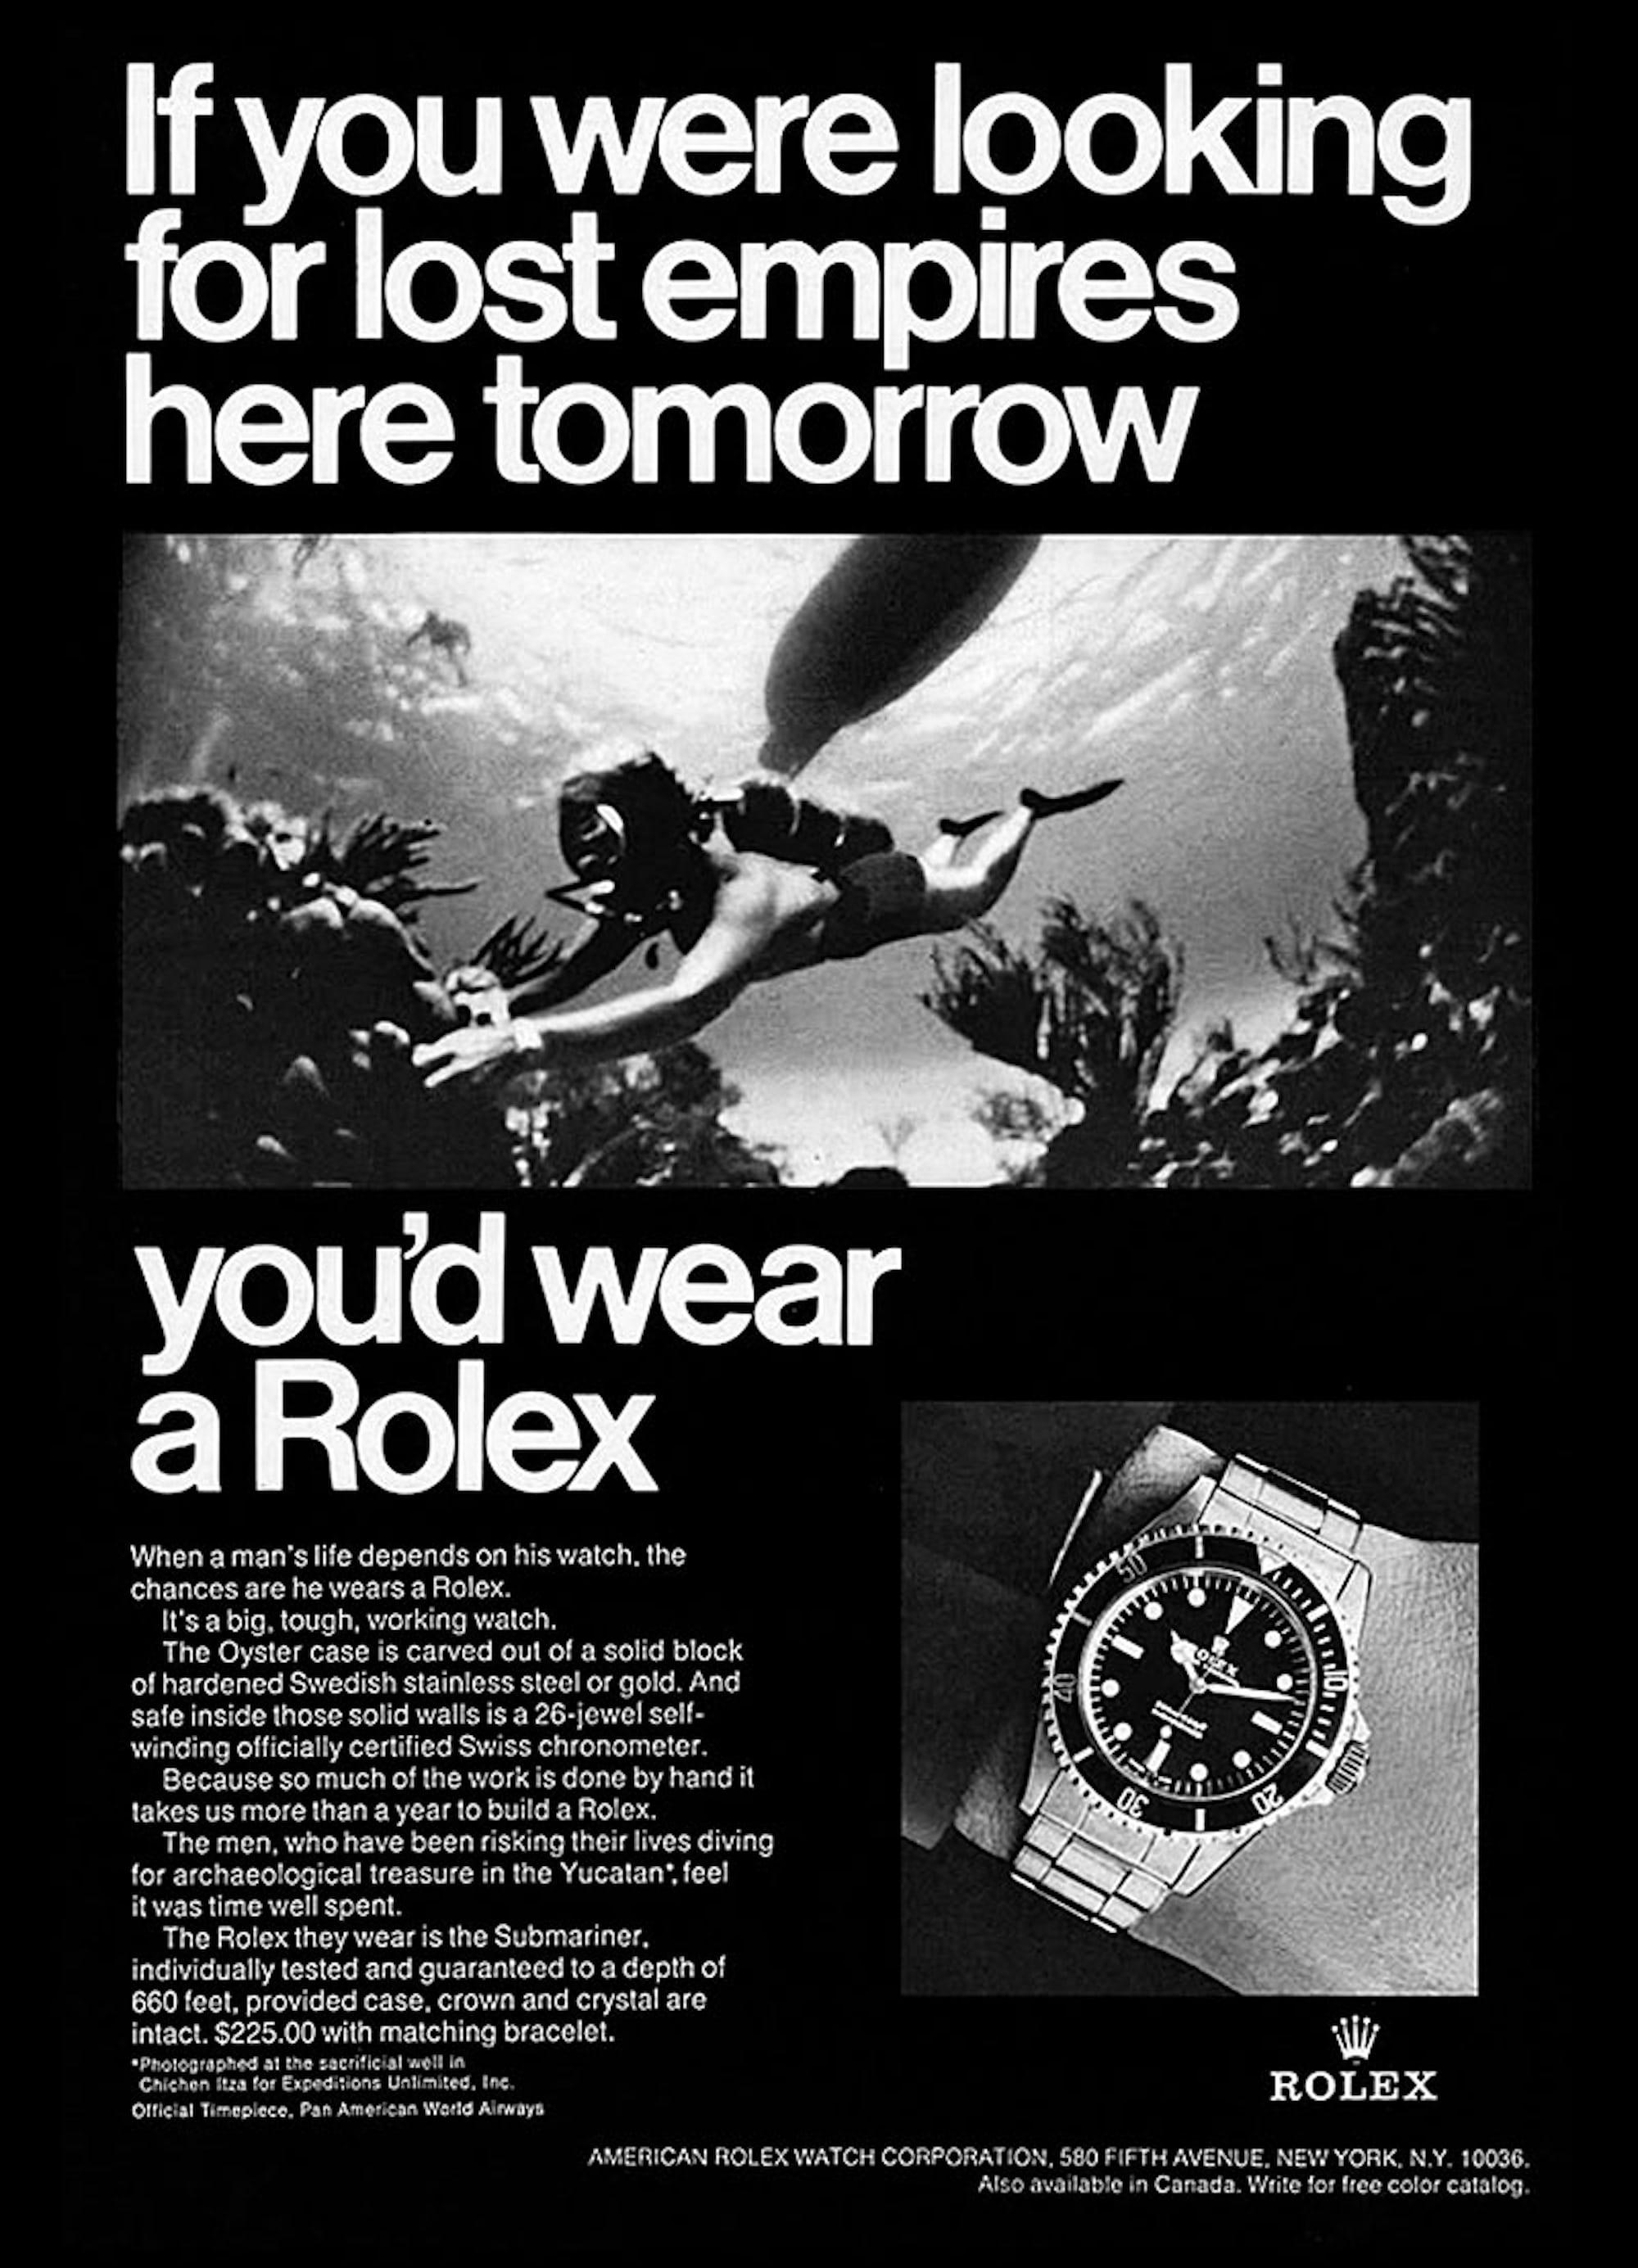 Reference Points: Understanding The Rolex Sea-Dweller Reference Points: Understanding The Rolex Sea-Dweller 1968 Rolex Submariner ad